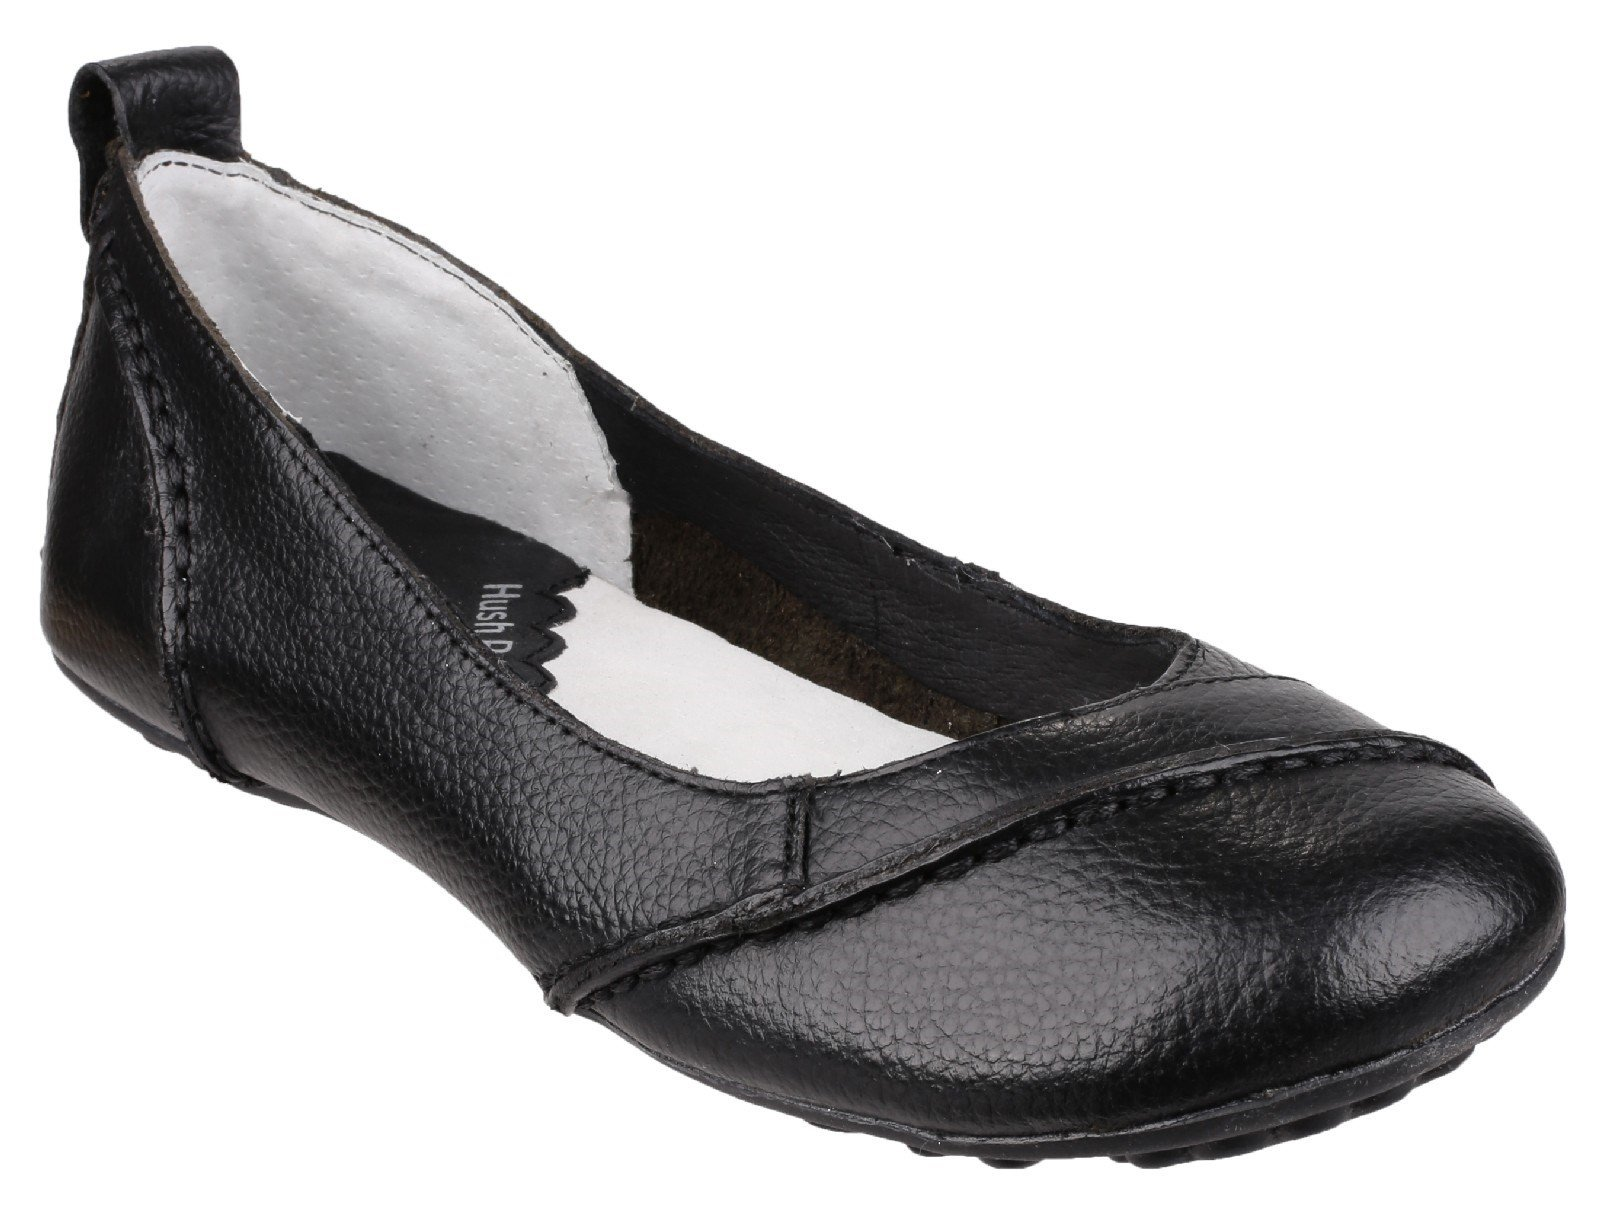 Hush Puppies Women's Janessa Slip On Flat Shoe Black 23258 - Black 3